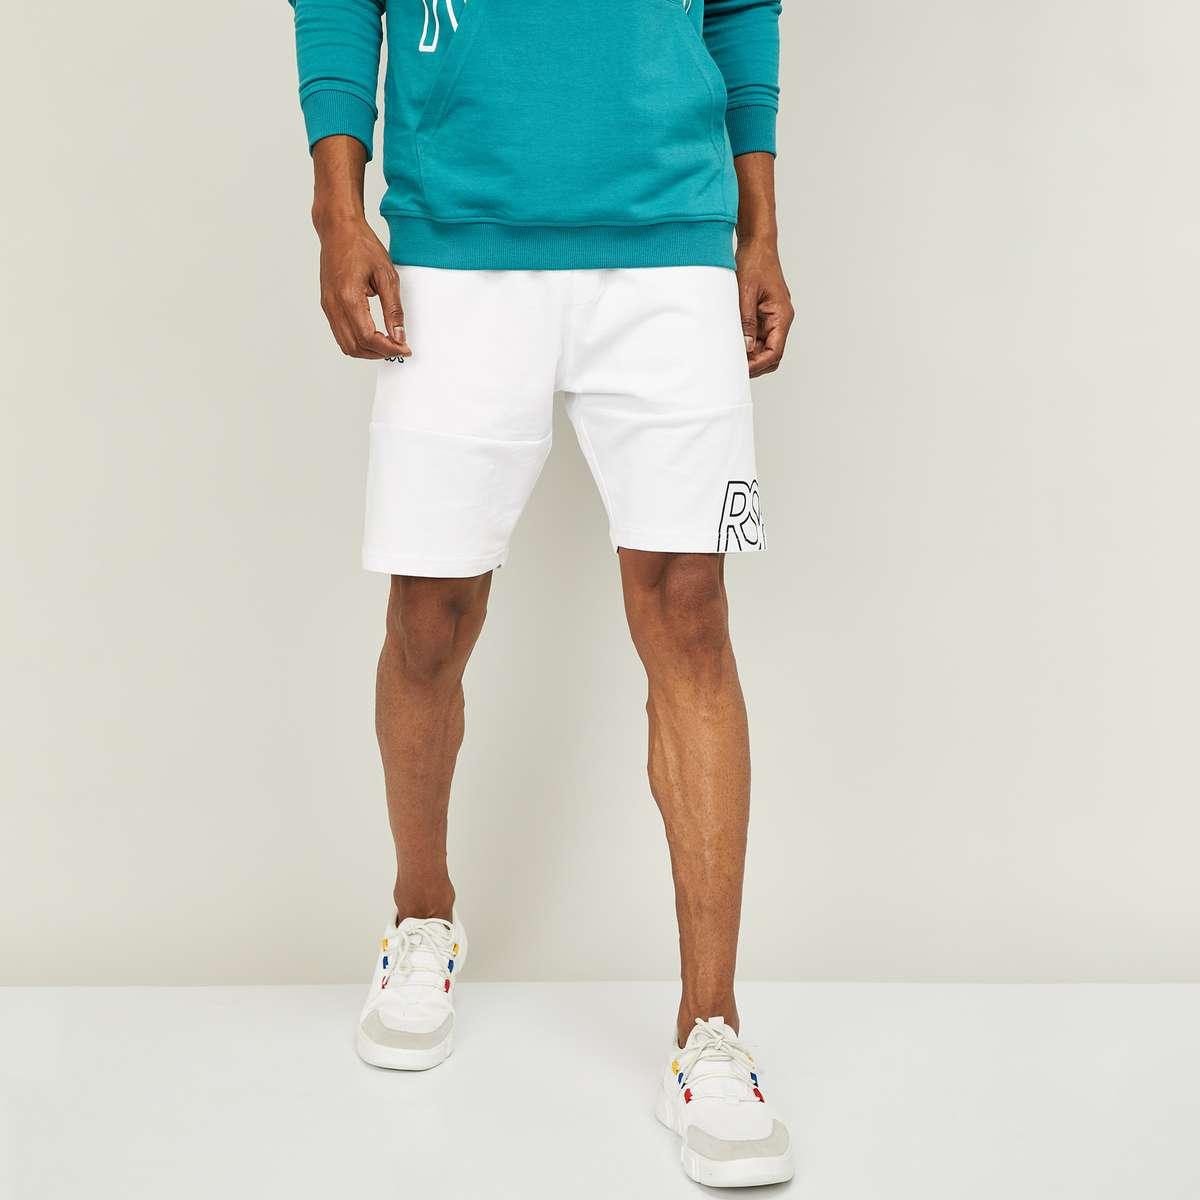 3.KAPPA Men Printed Elasticated Shorts